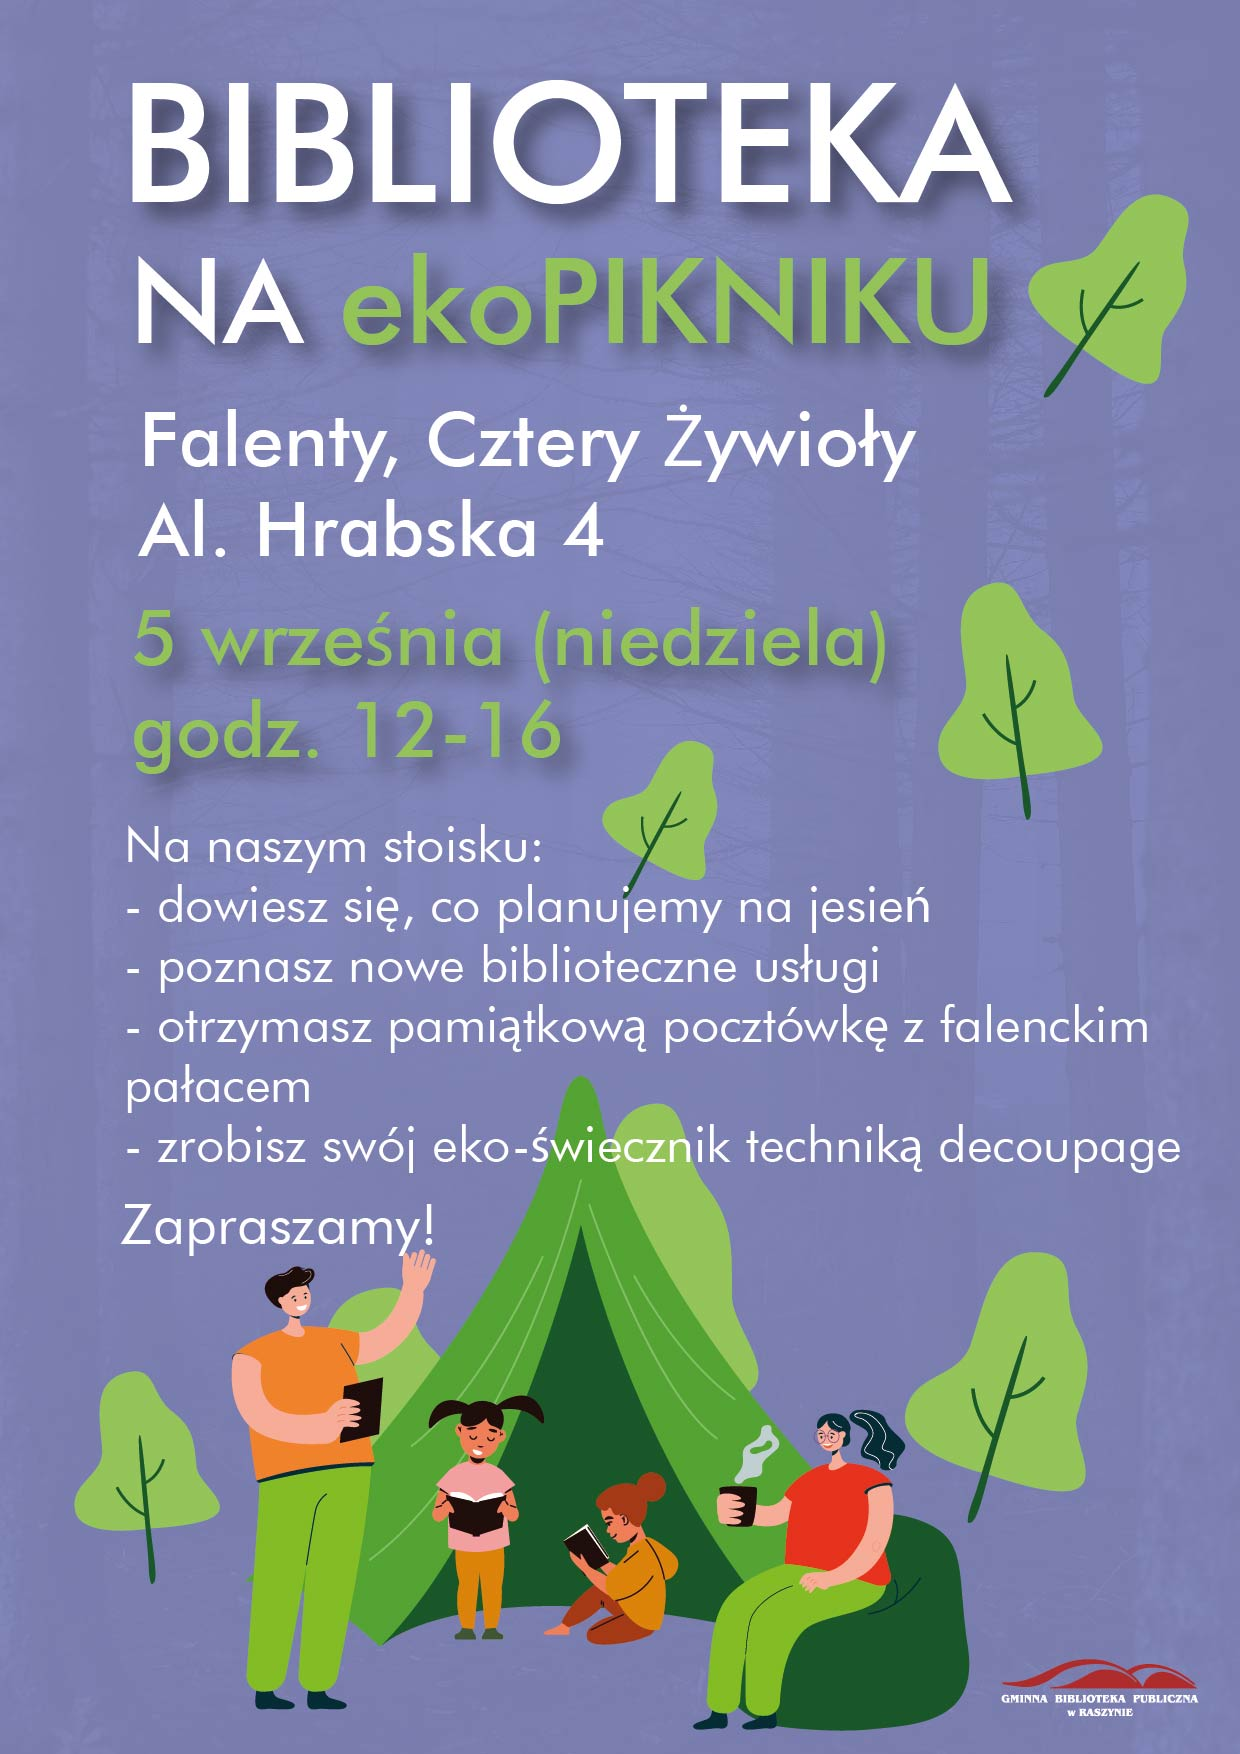 Biblioteka na ekopikniku - plakat